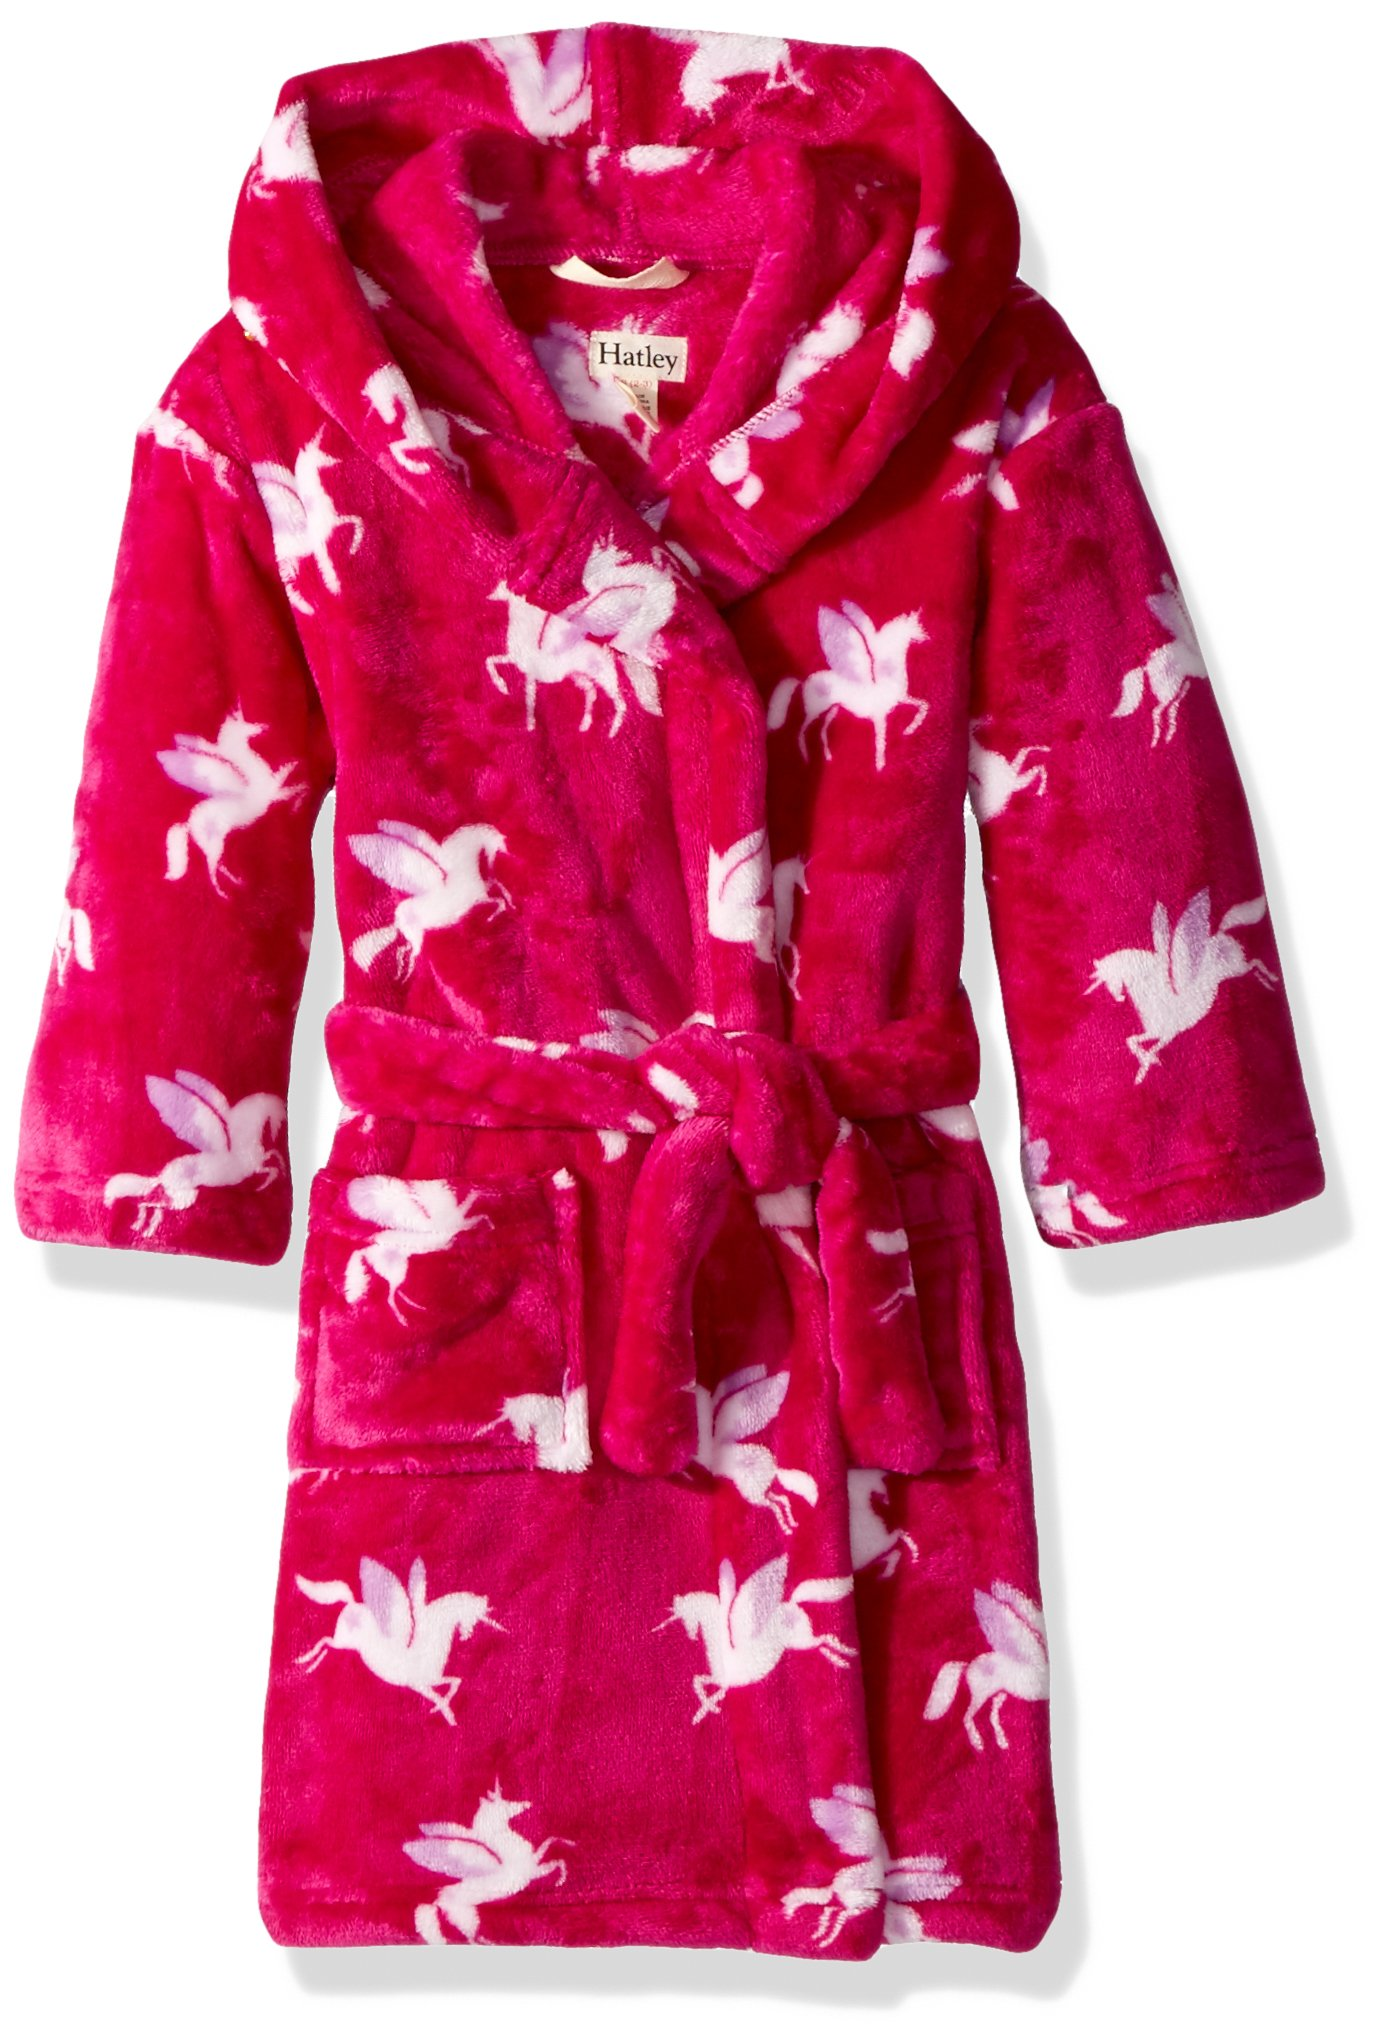 Hatley Girls Fleece Robe Dressing Gown